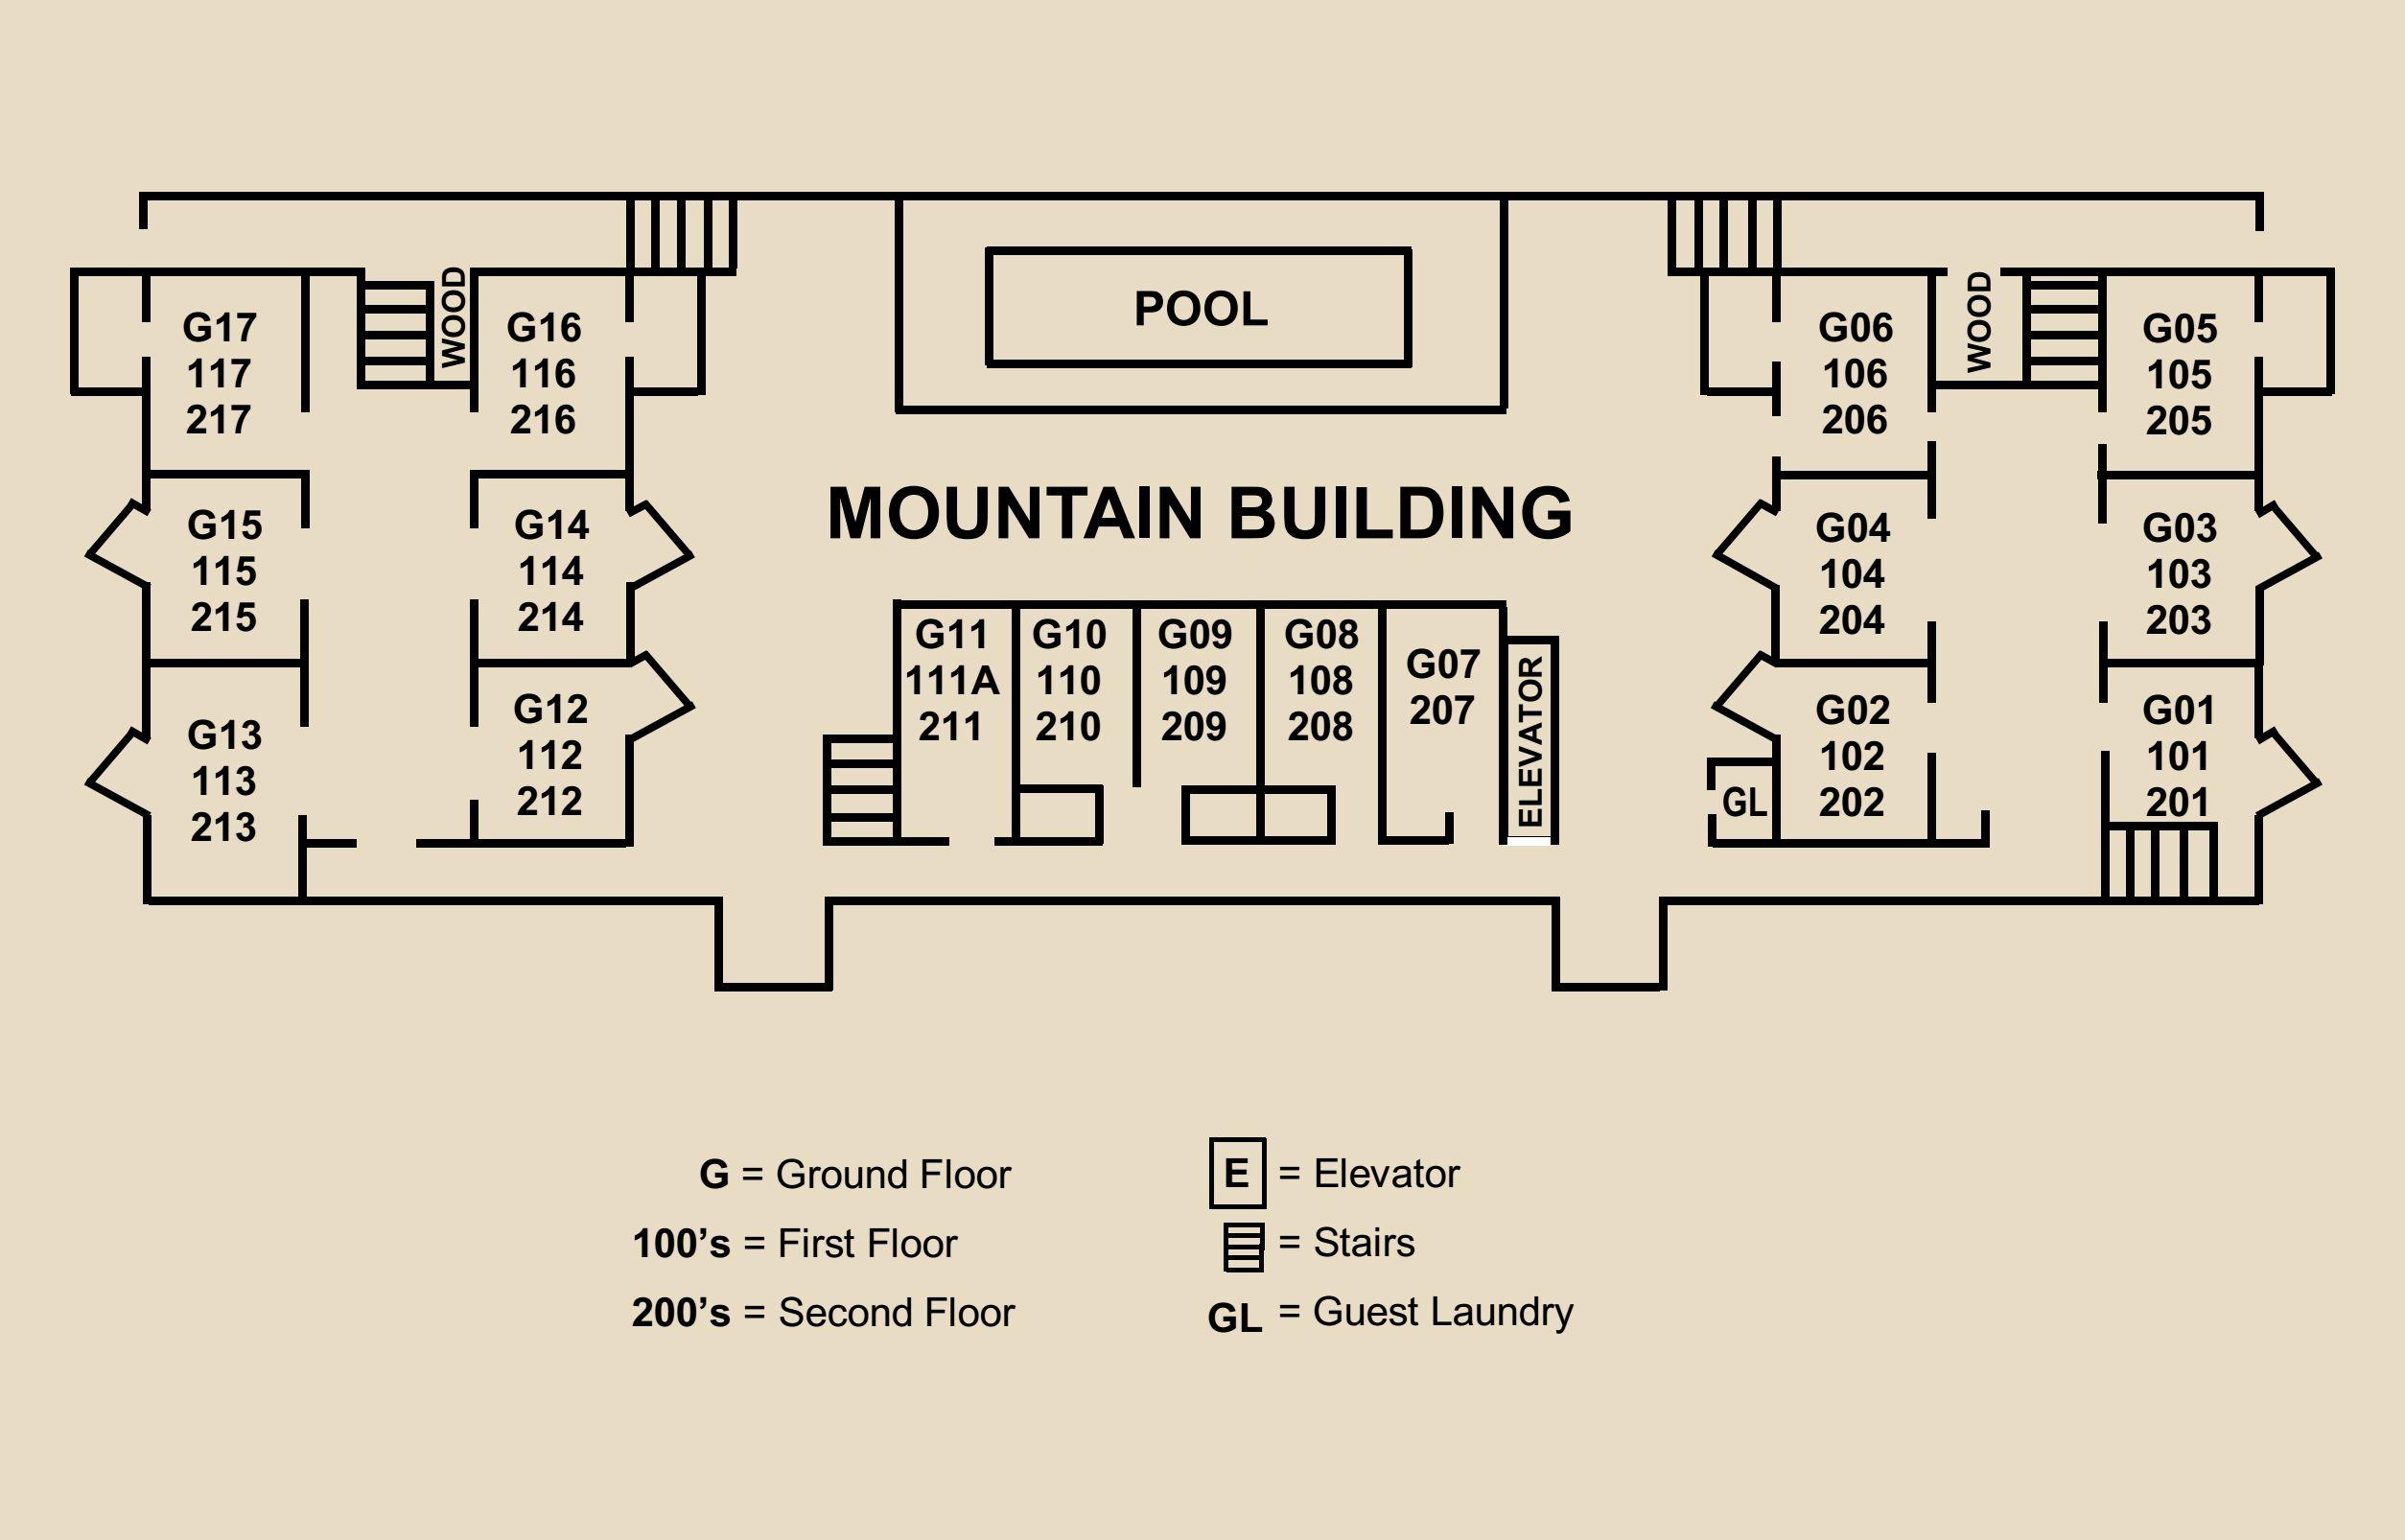 Gallery Lift West Condominiums Elevator Schematic Mountain Building Floor Plan Diagram